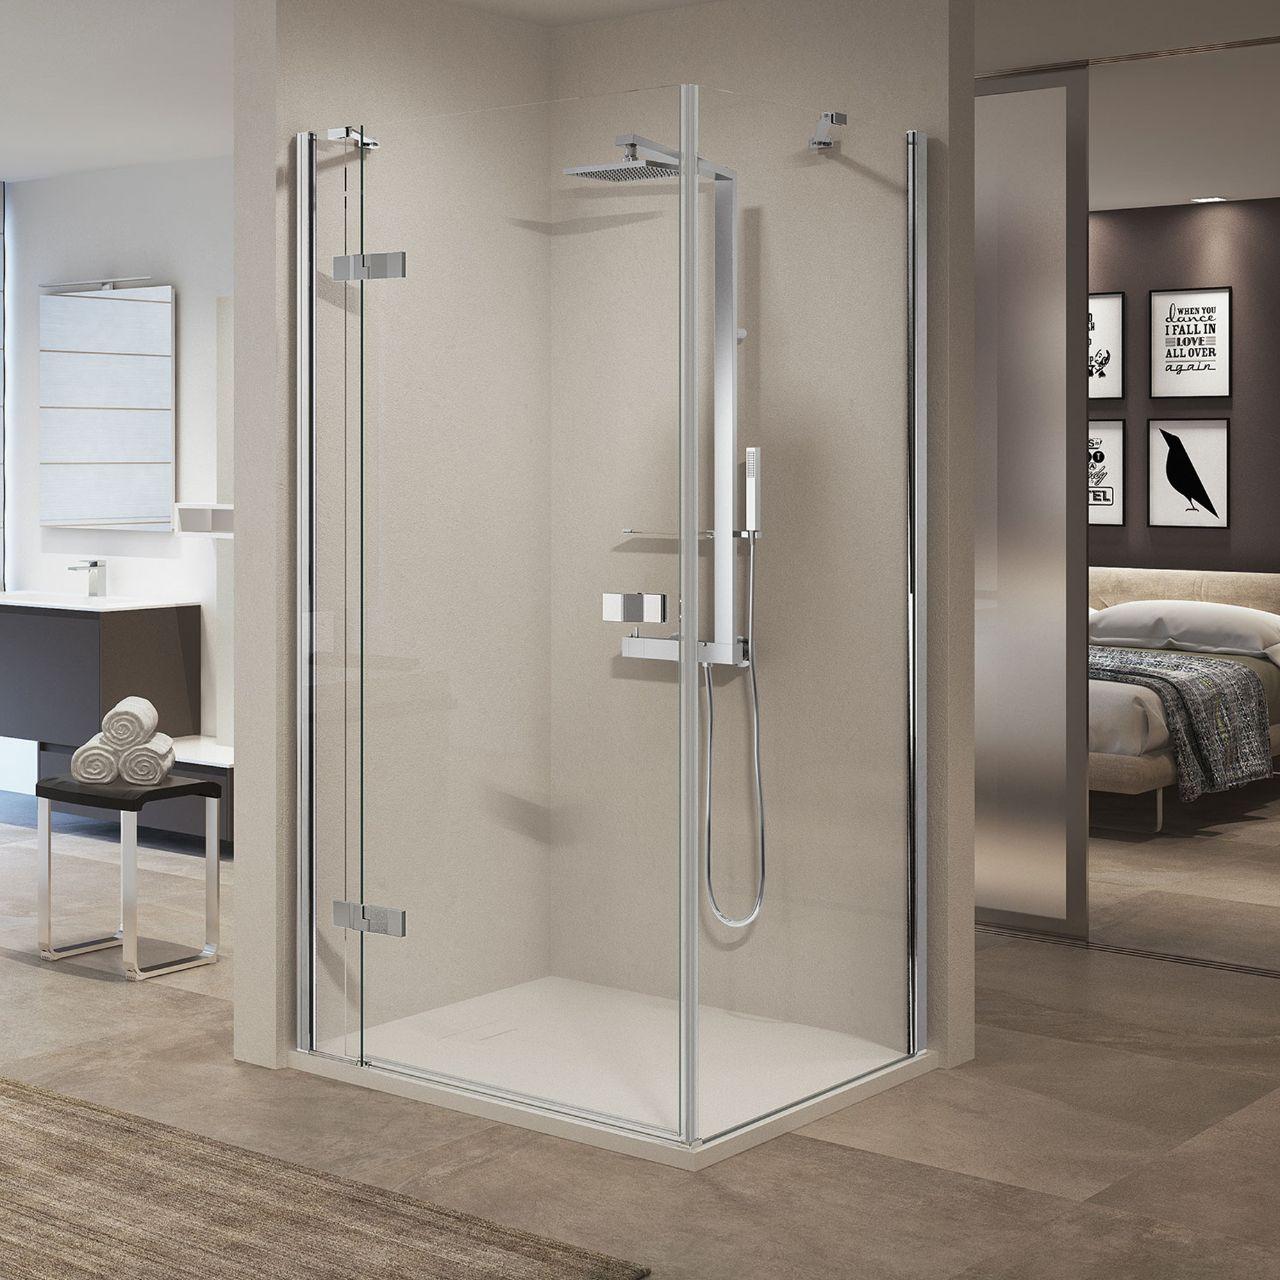 box doccia gala g f novellini. Black Bedroom Furniture Sets. Home Design Ideas